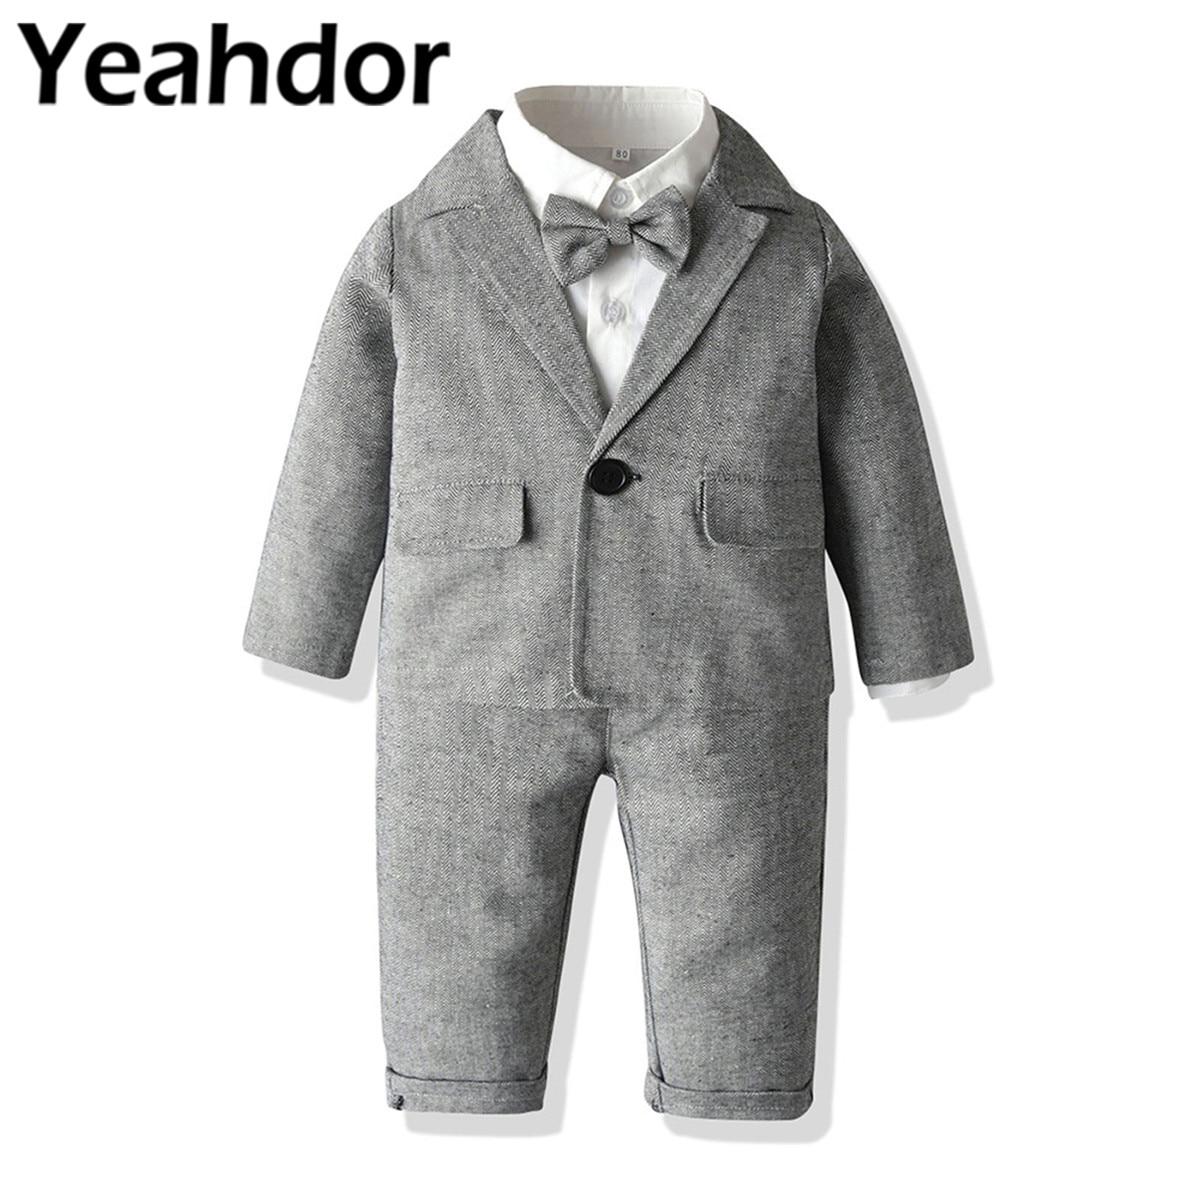 Wedding Boys Suits Children's Gentleman Outfit Bowtie Shirt + Suspenders Long Pants Dress Blazer Boy's Party Set Formal Costume